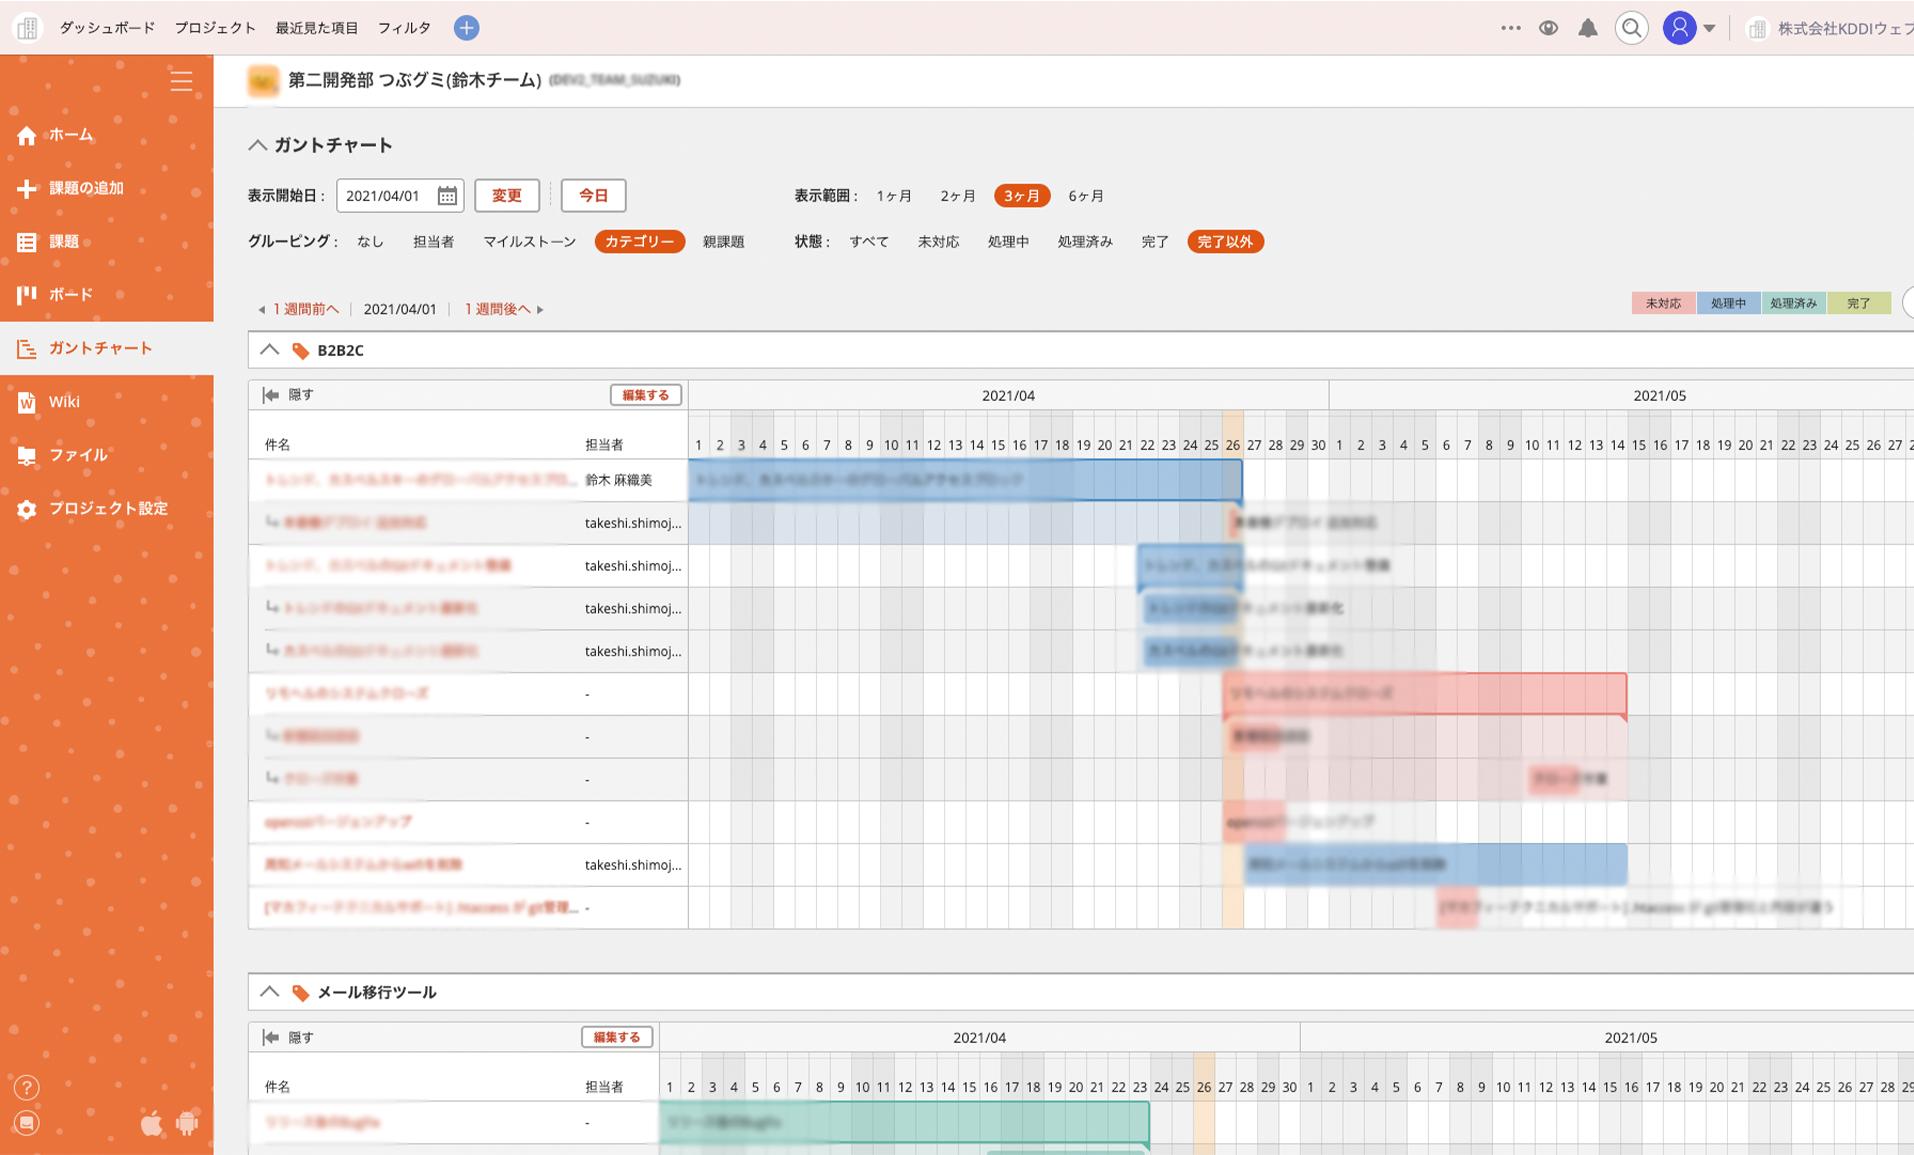 Backlogのガントチャート上で、カテゴリ機能で開発チームの区分がされている